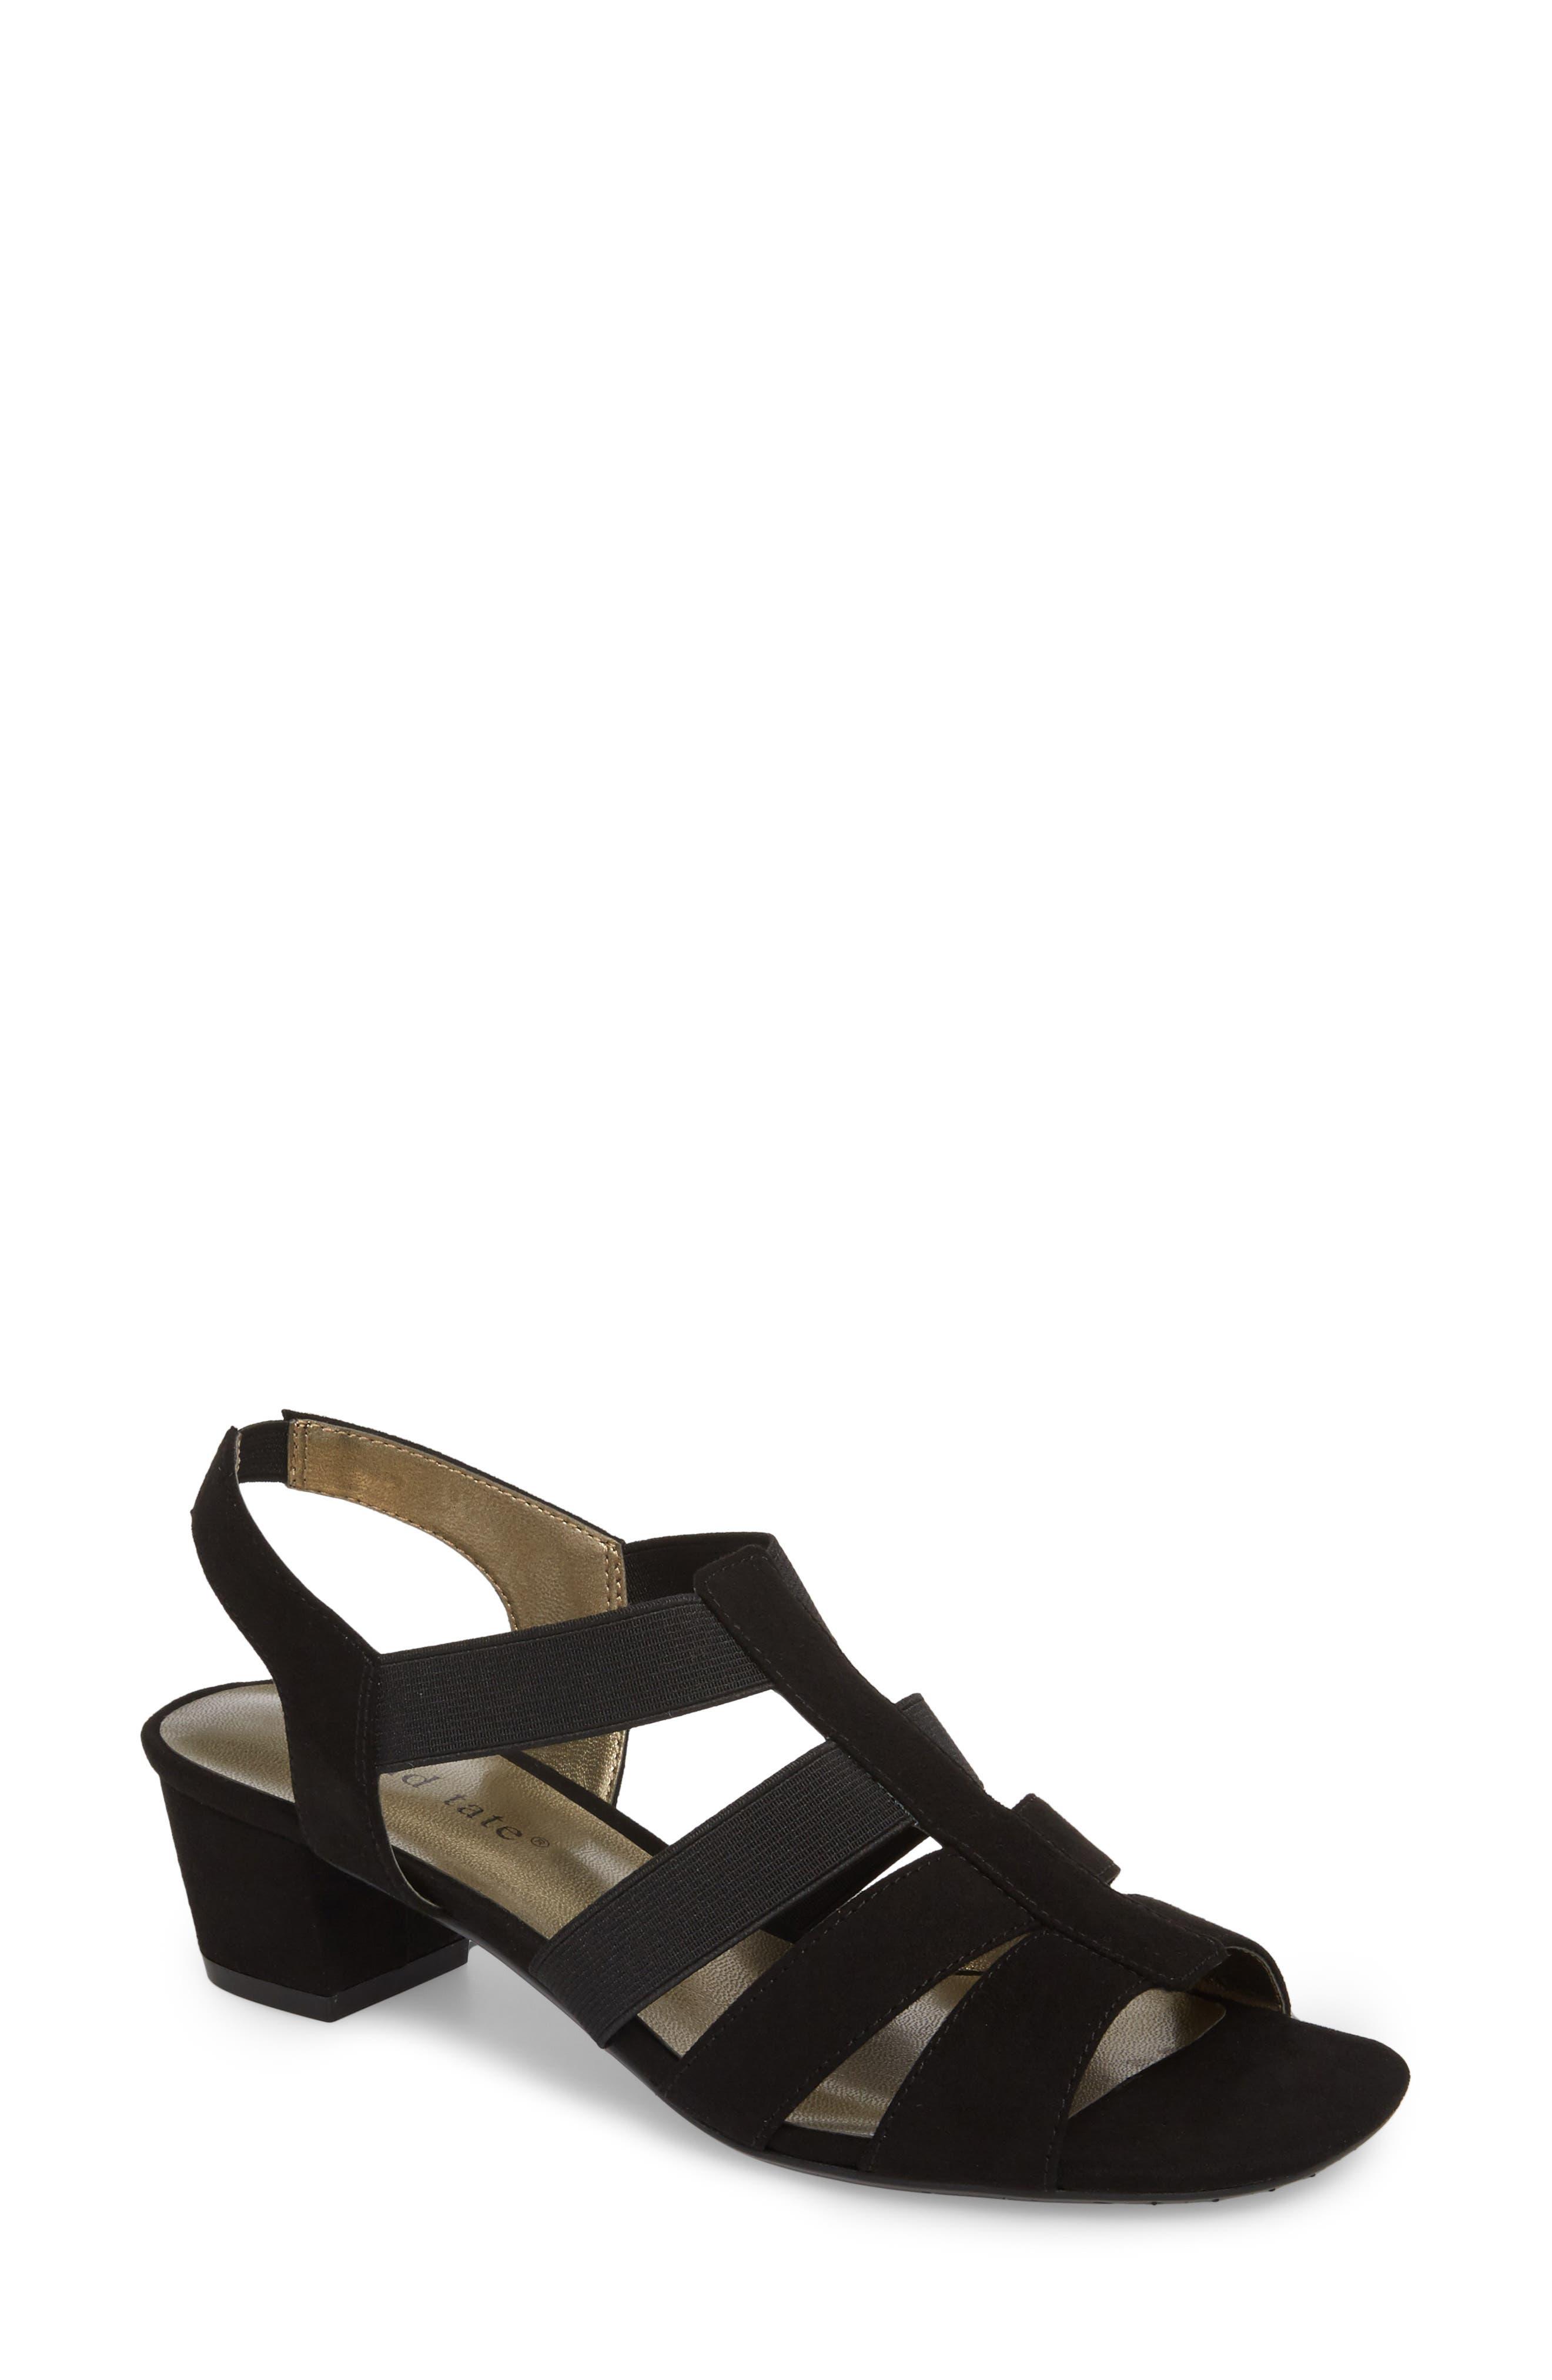 Delight Slingback Cage Sandal,                         Main,                         color, Black Suede